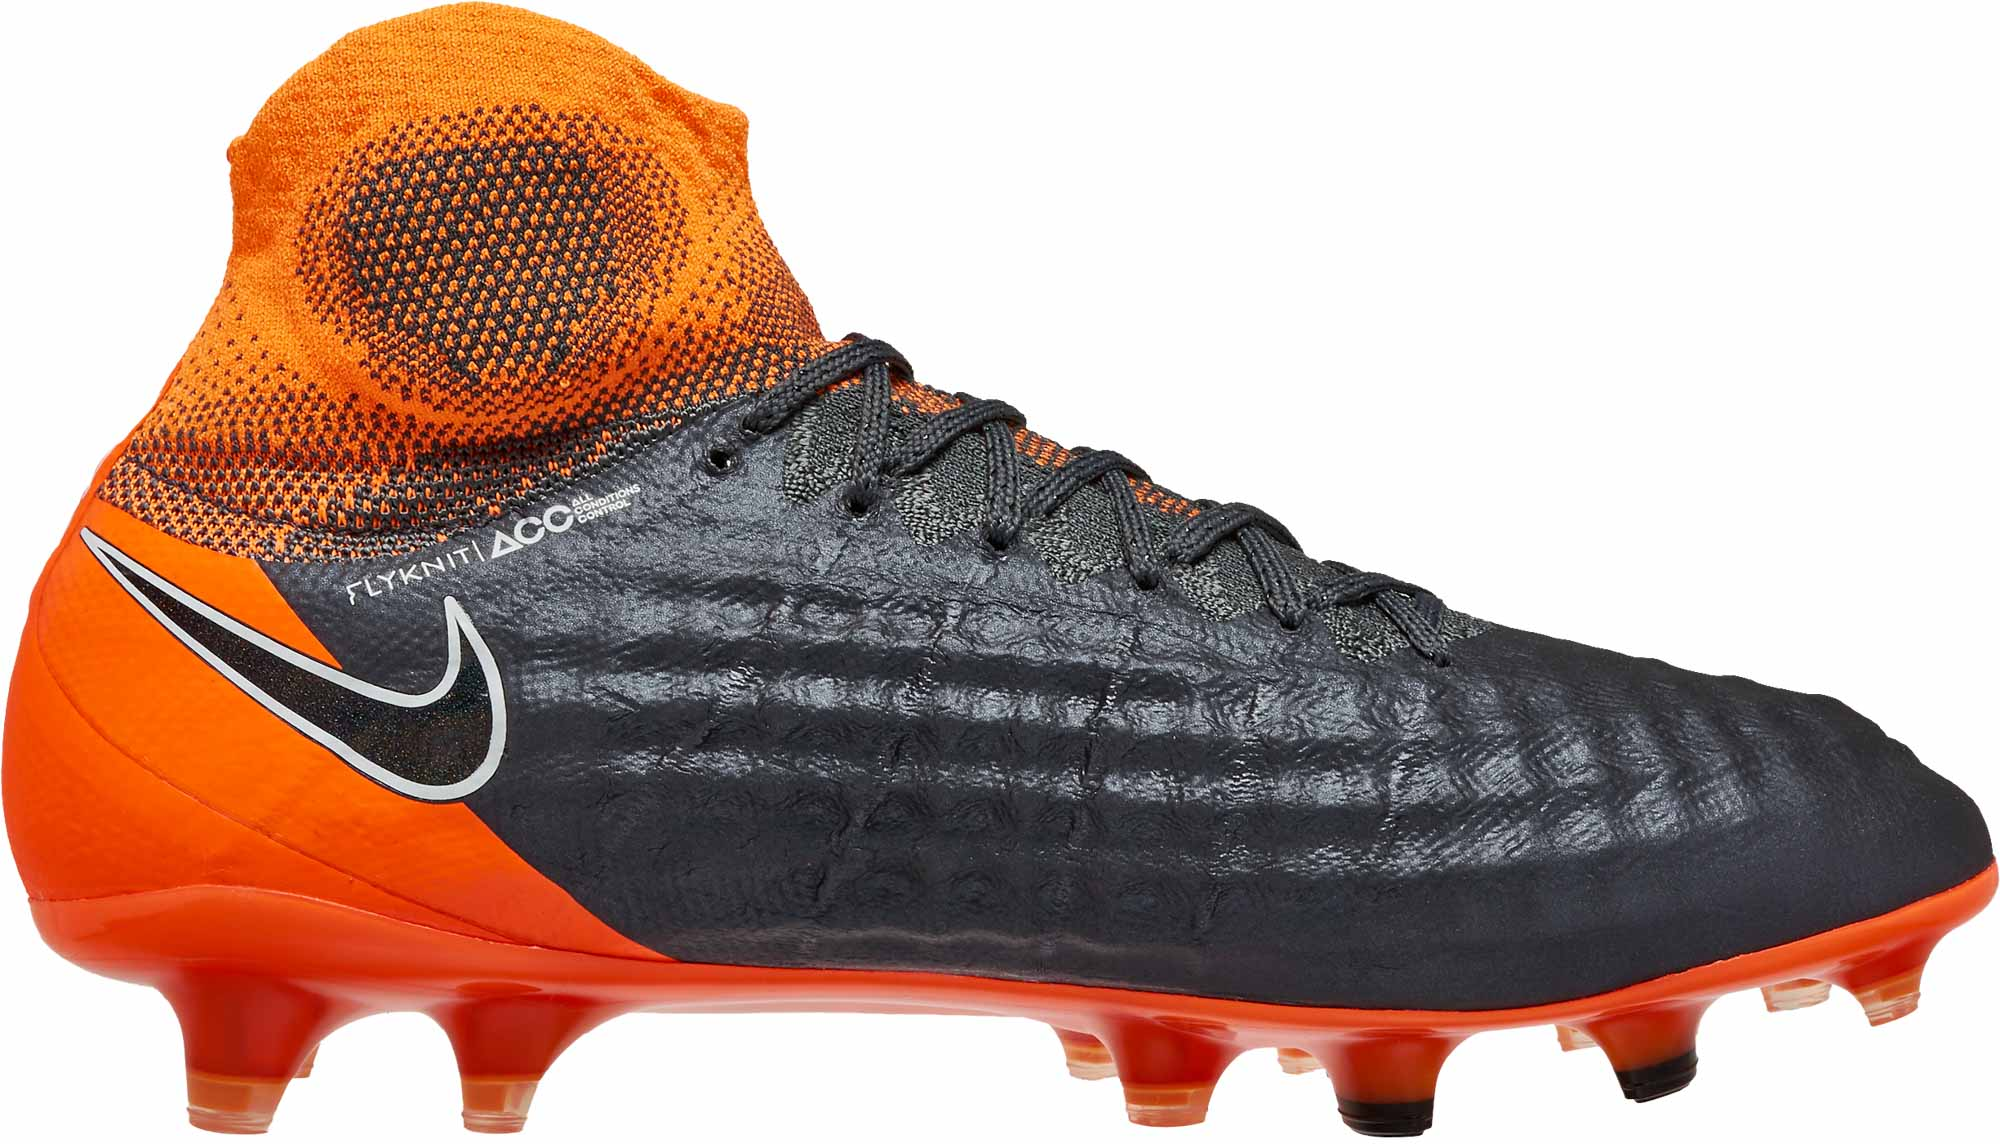 3a6e4ab48eab0 Nike Magista Obra 2 Elite DF FG – Dark Grey Total Orange